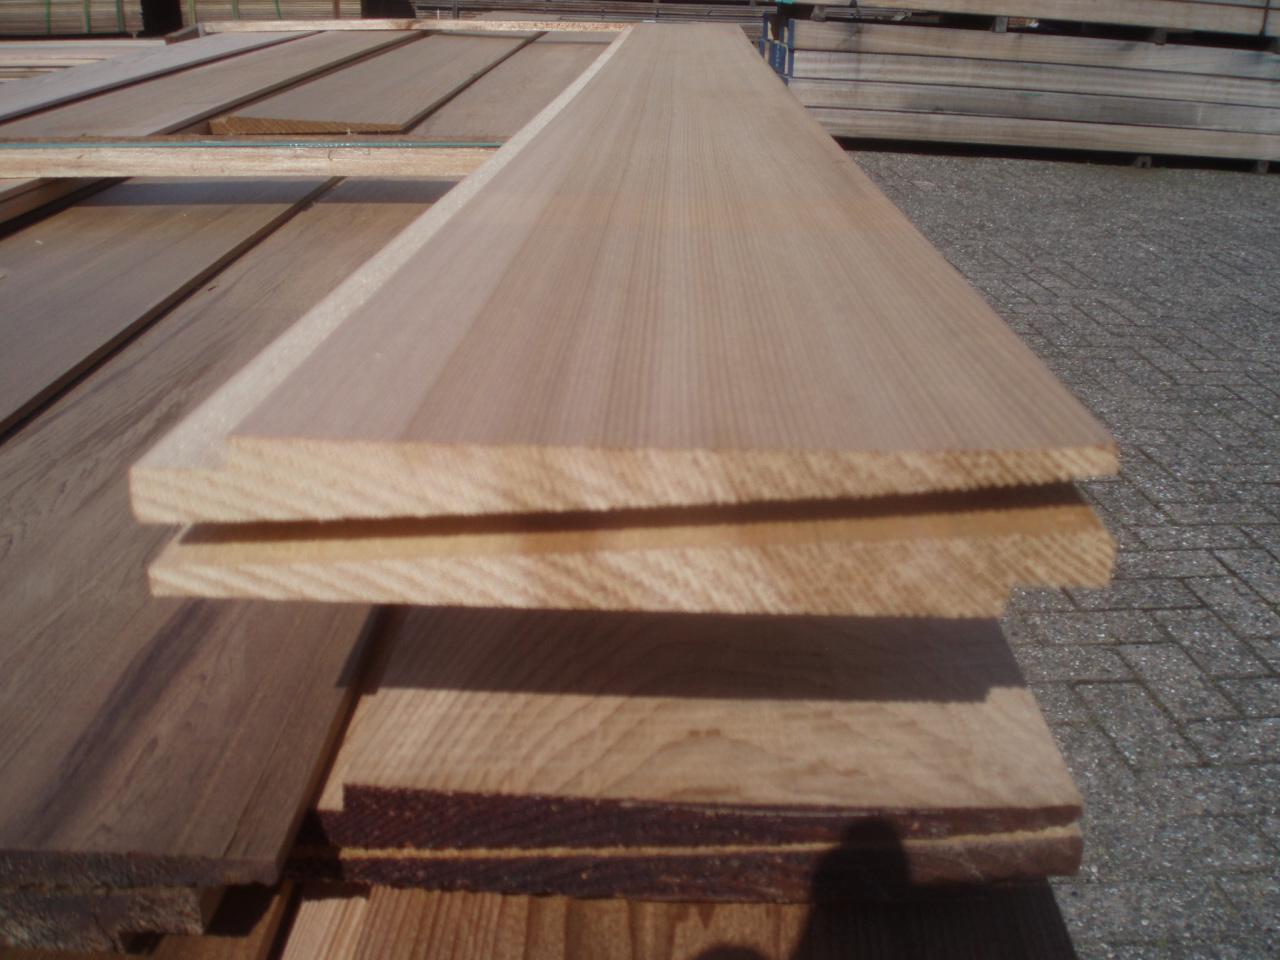 Red Cedar Zweeds Rabat Bevelsiding Gevelbekleding 6